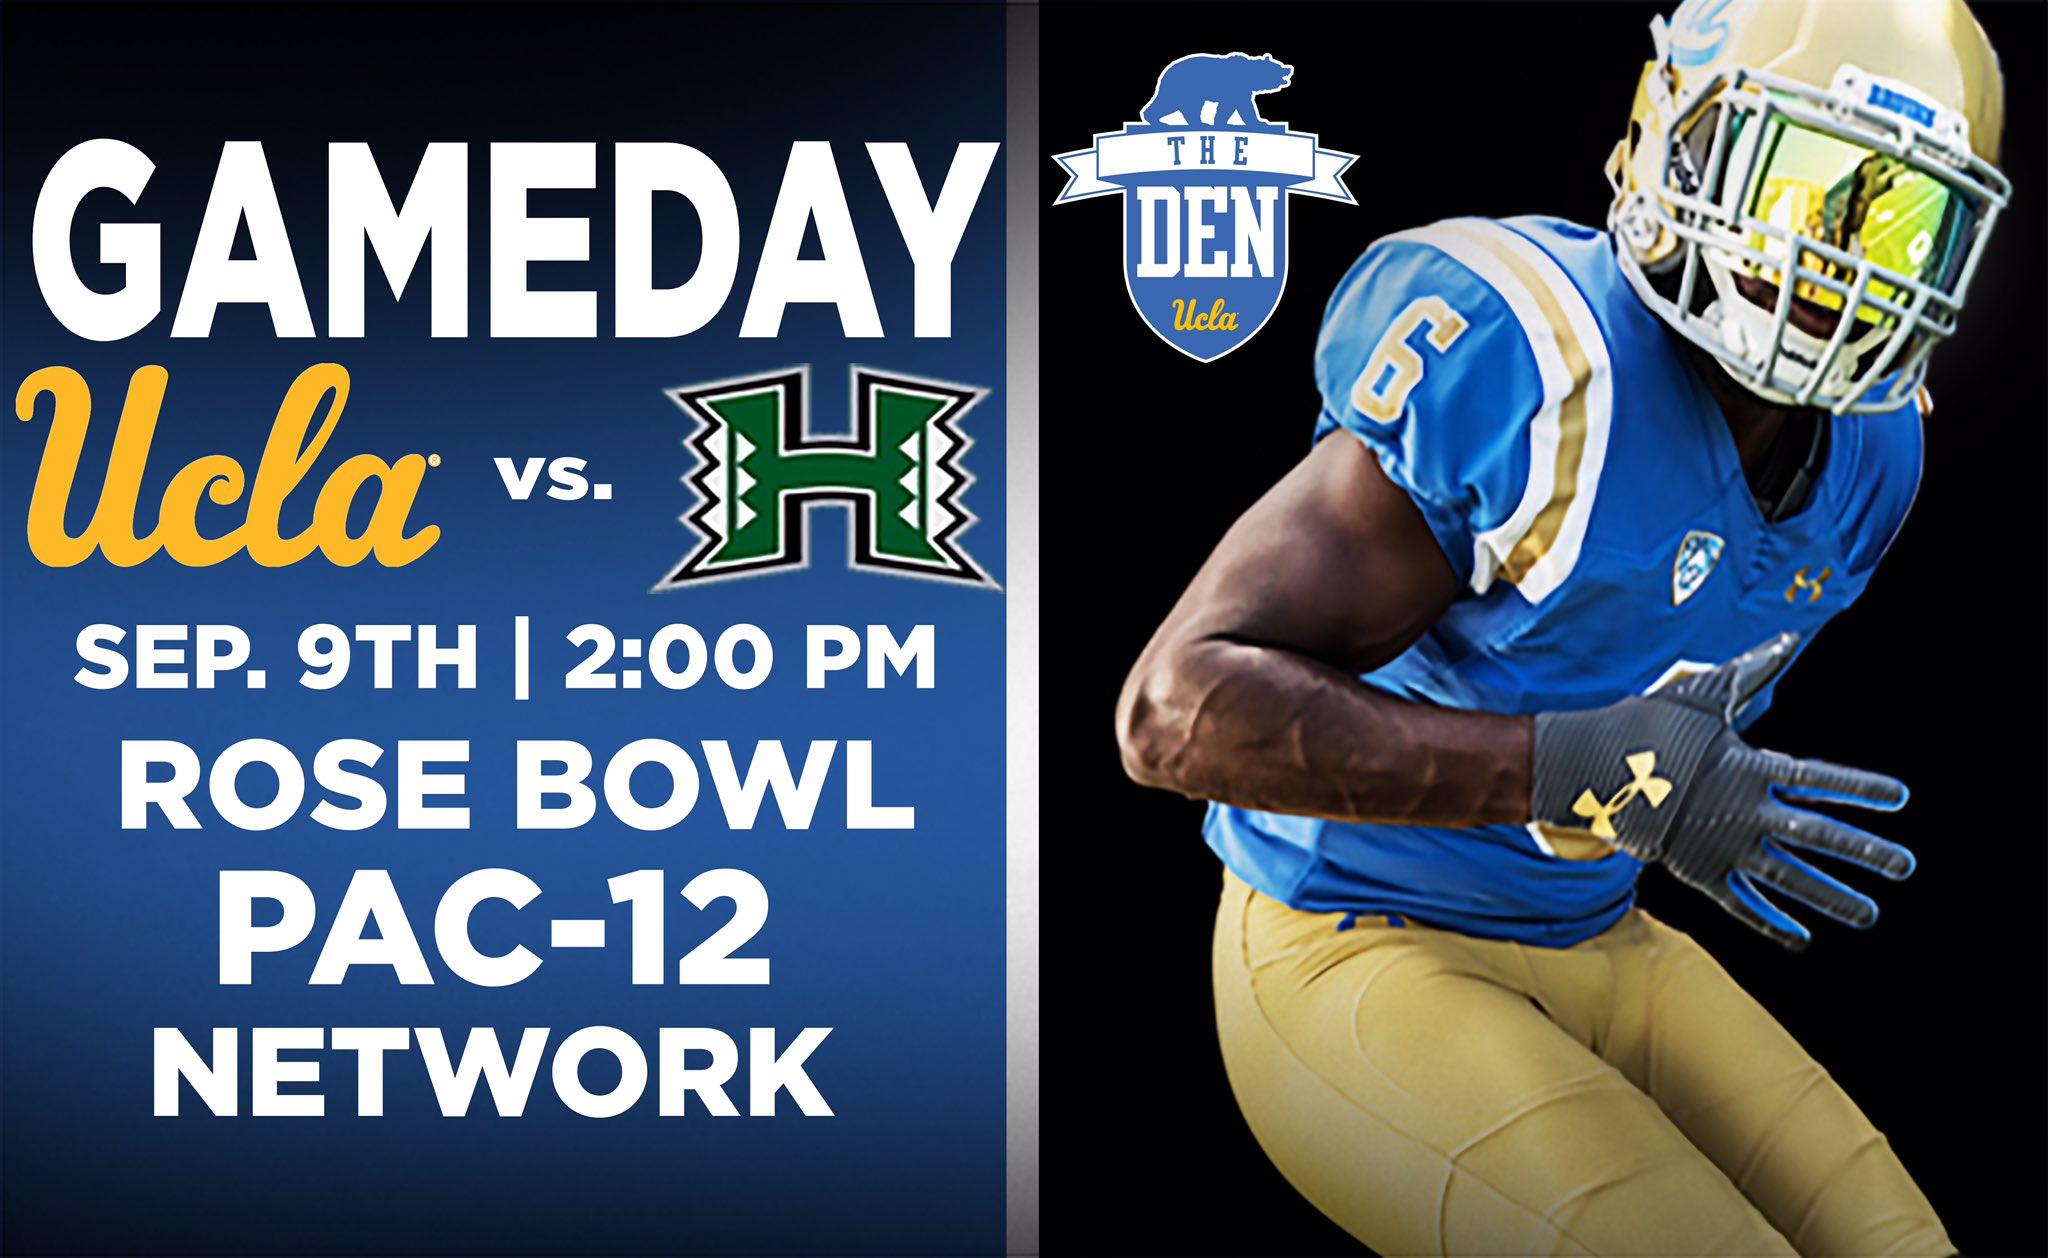 GET UP, IT'S GAMEDAY   ��: @UCLAFootball vs. Hawaii ��: 2:00 PM PT ��: @RoseBowlStadium  ��: @Pac12Network   #BeatHawaii https://t.co/vL5wk4da2S